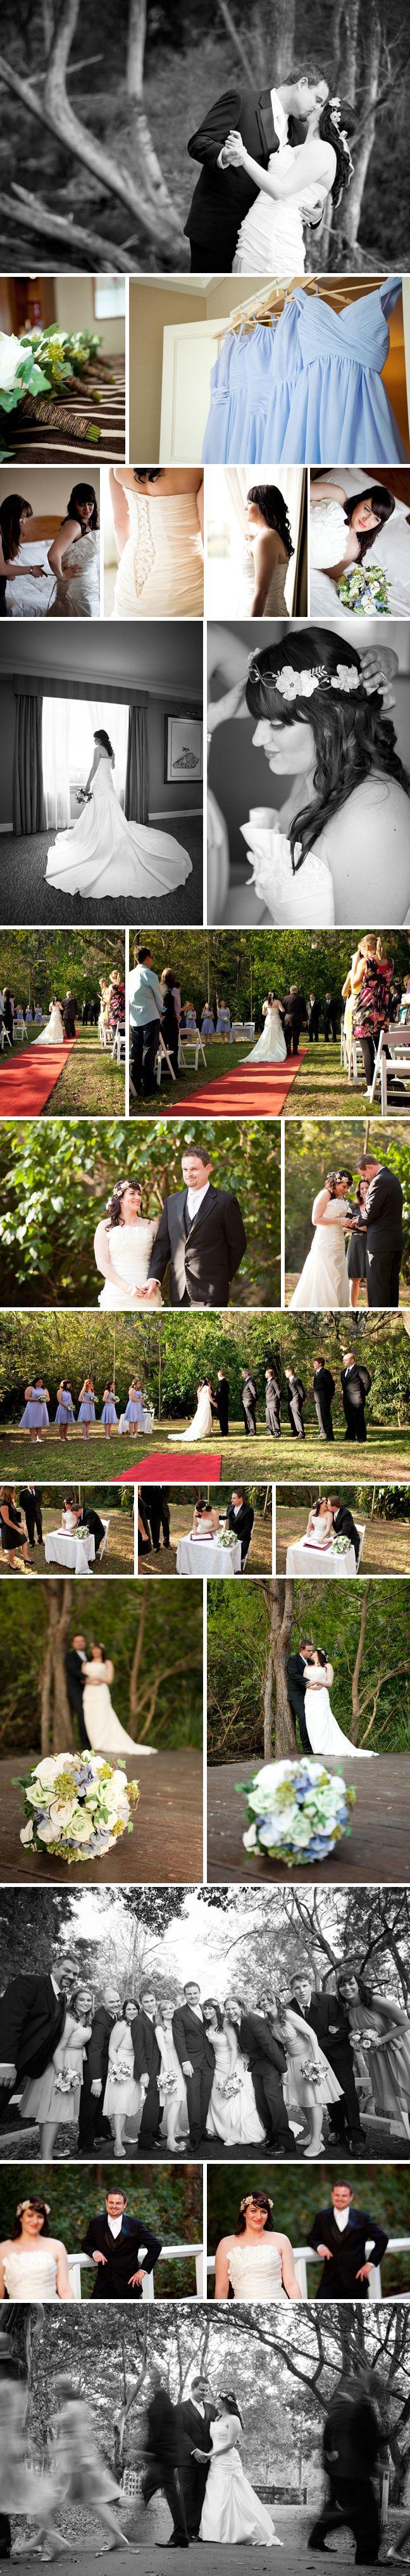 Belinda & Joshua's Wedding by BriannaKate Photography